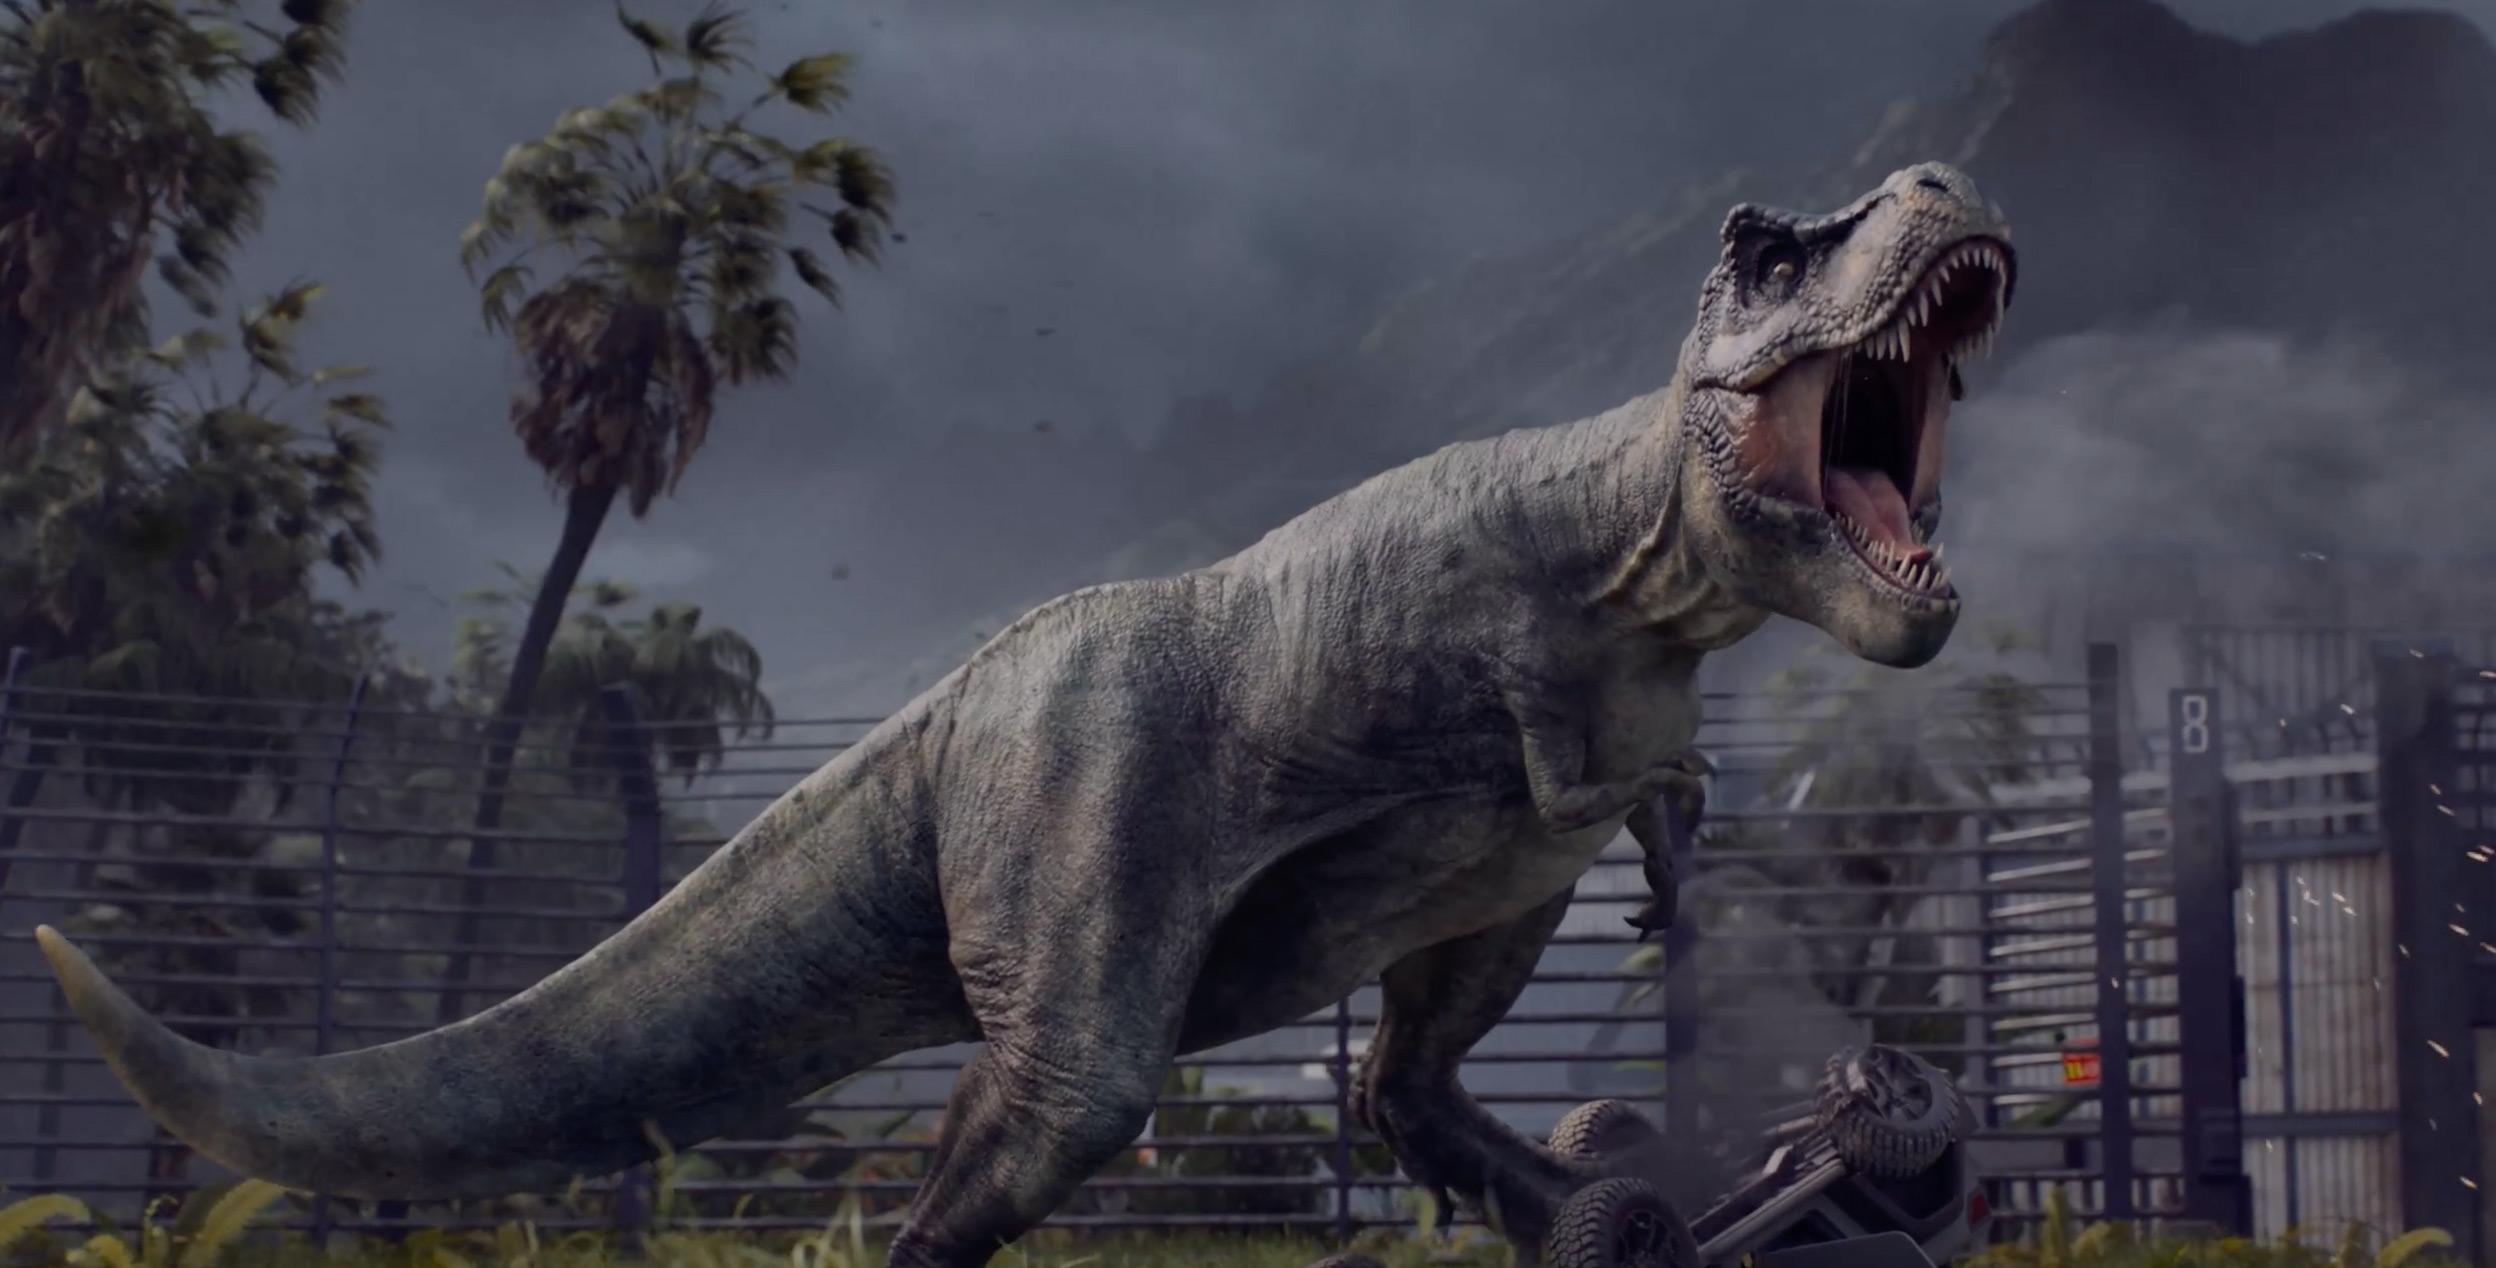 Life, uh, finds a way in Jurassic World Evolution screenshot